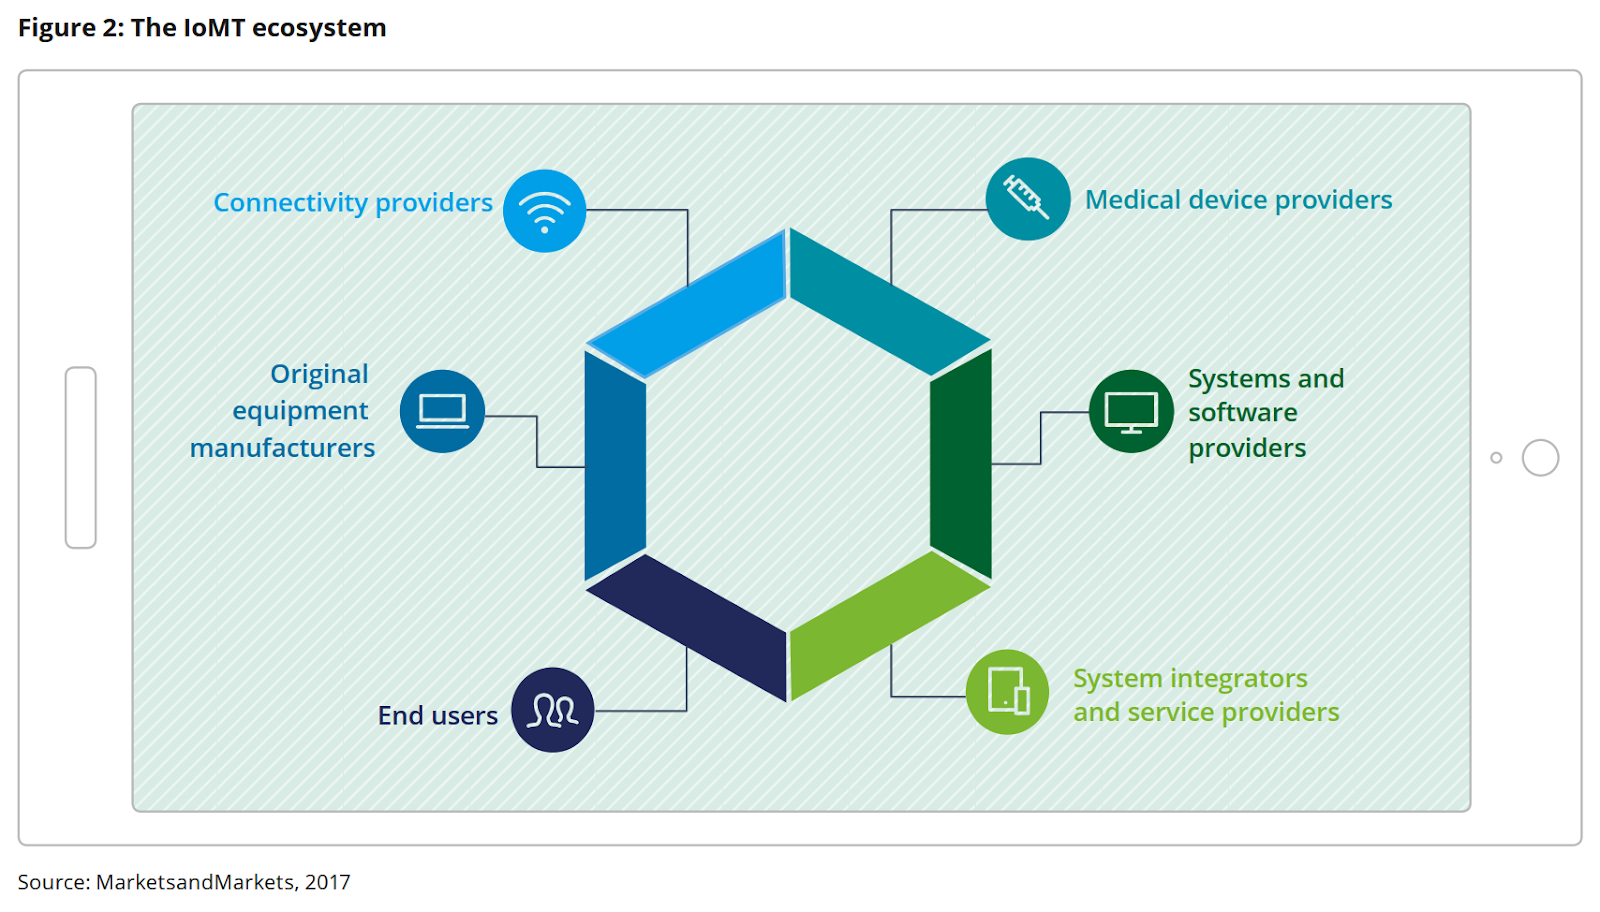 IoMT ecosystem